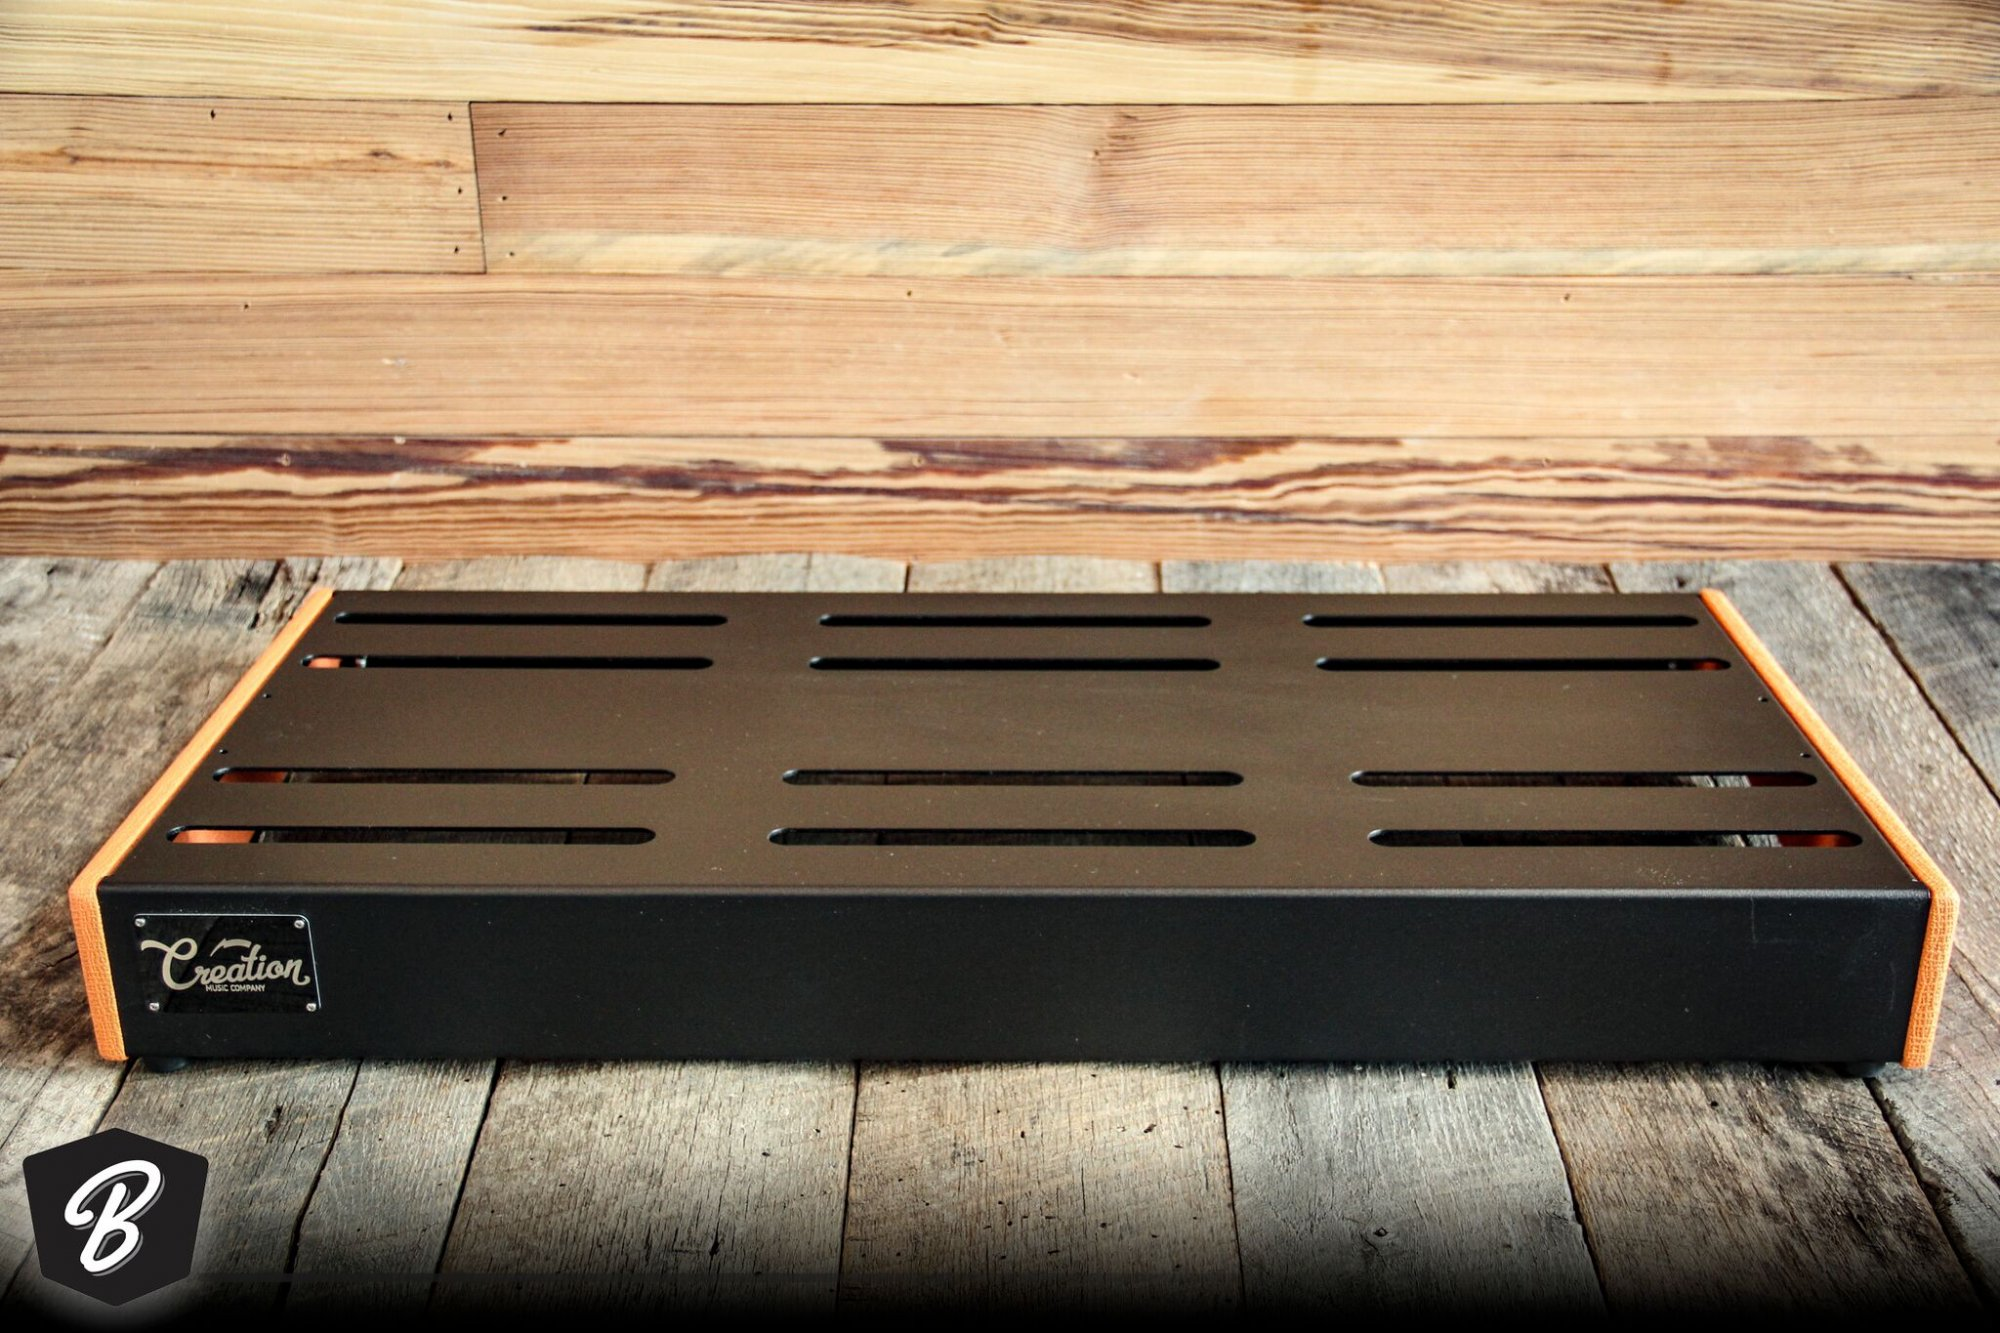 Creation Music Company 32 x 16 Elevation Series Board Orange Nubtex